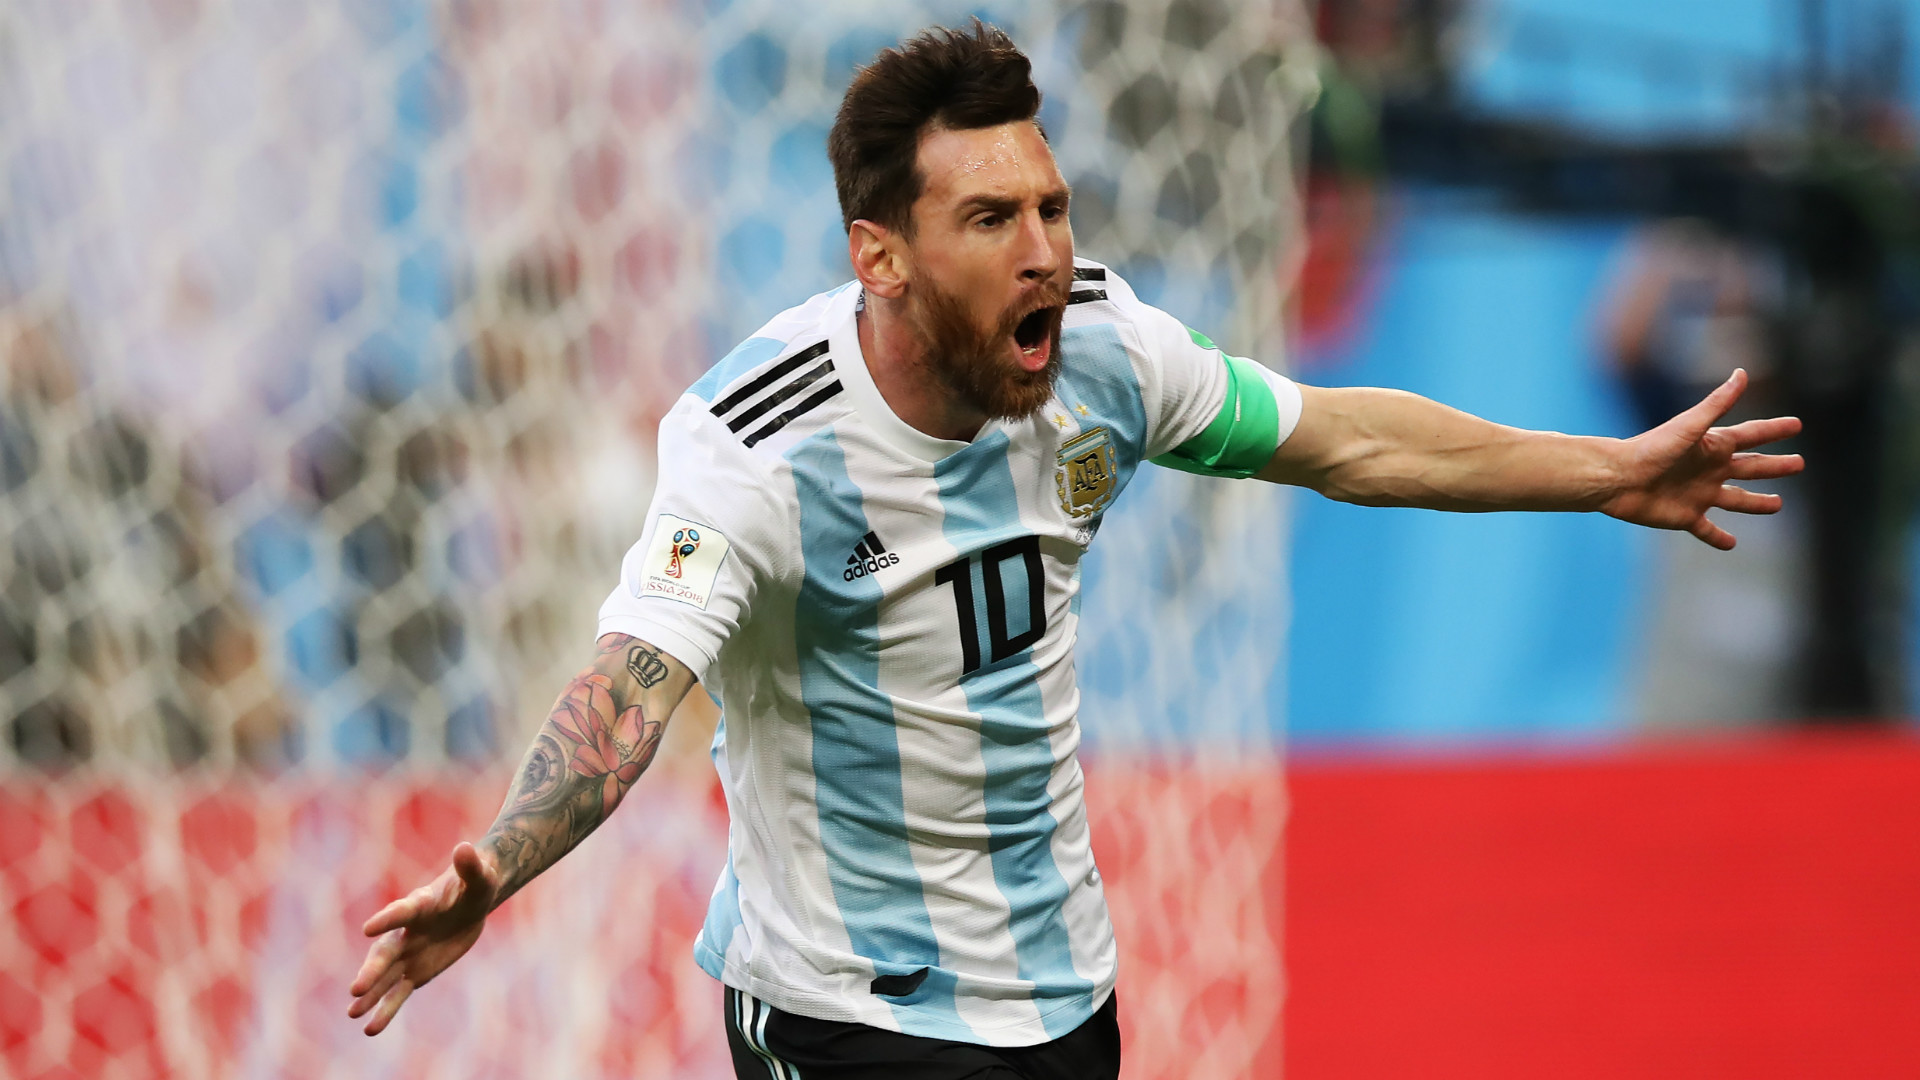 Messi Wallpaper 2018 Hd 81 Images